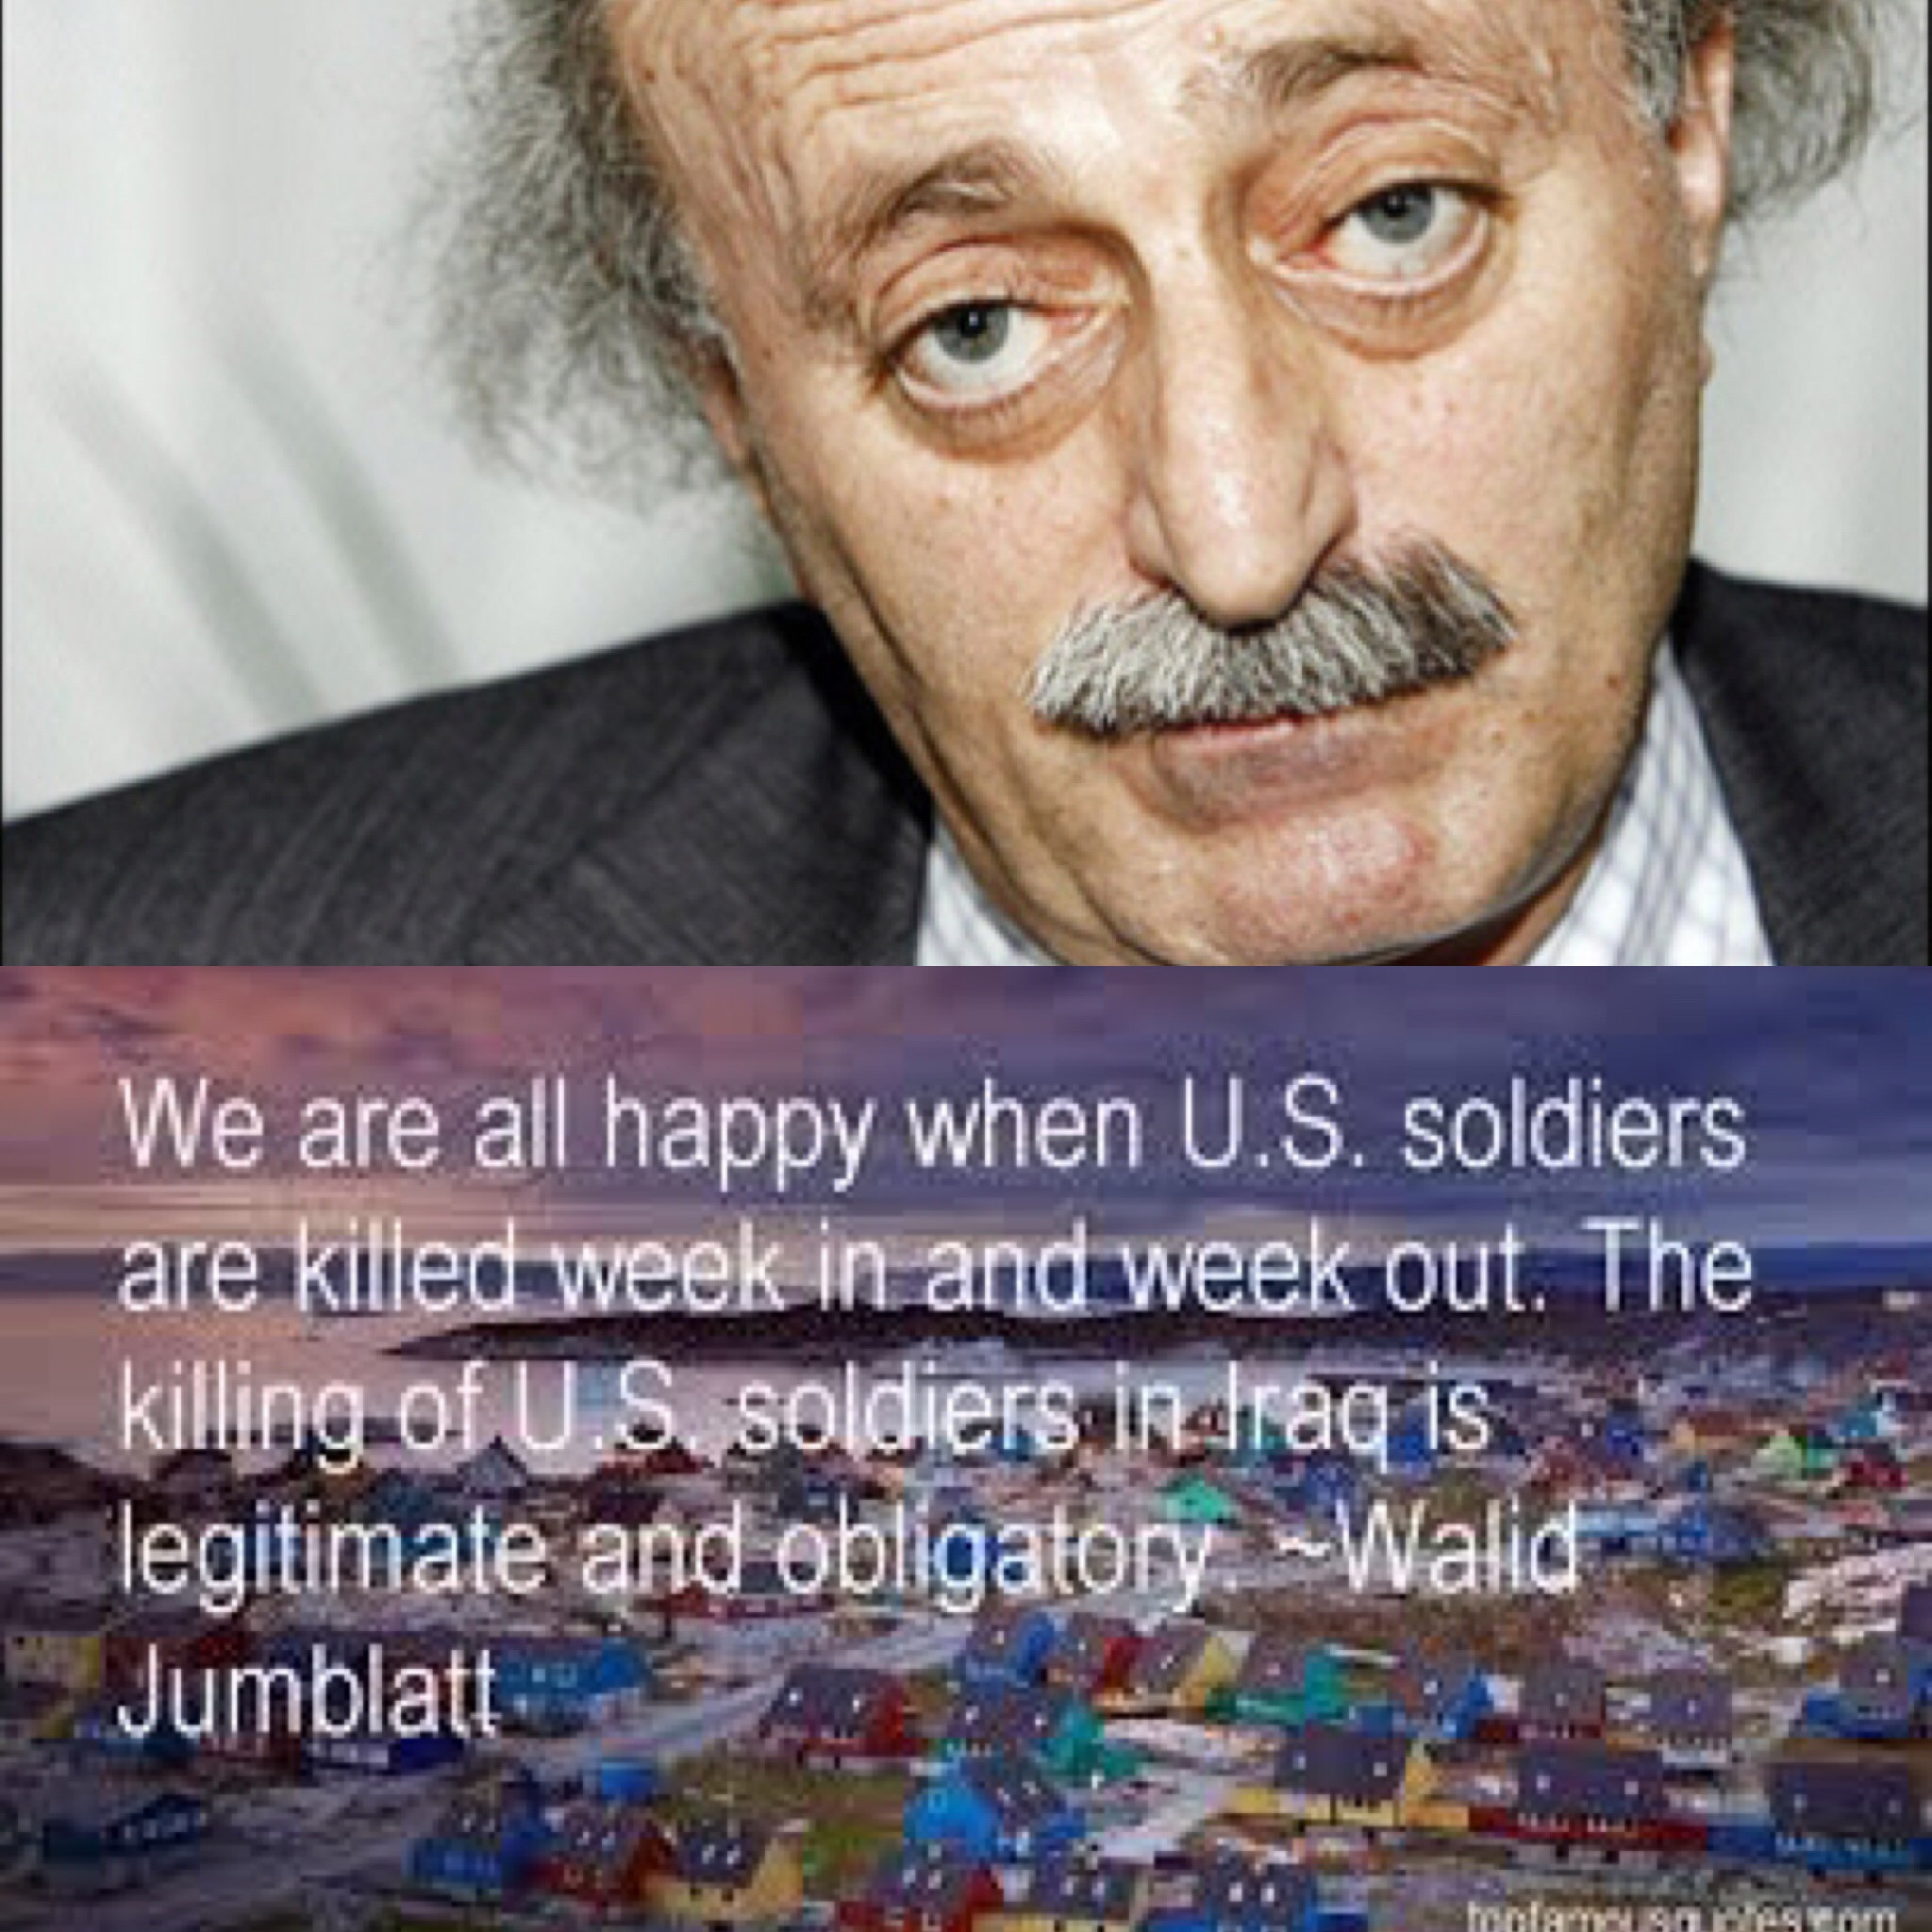 Walid Jamblatt